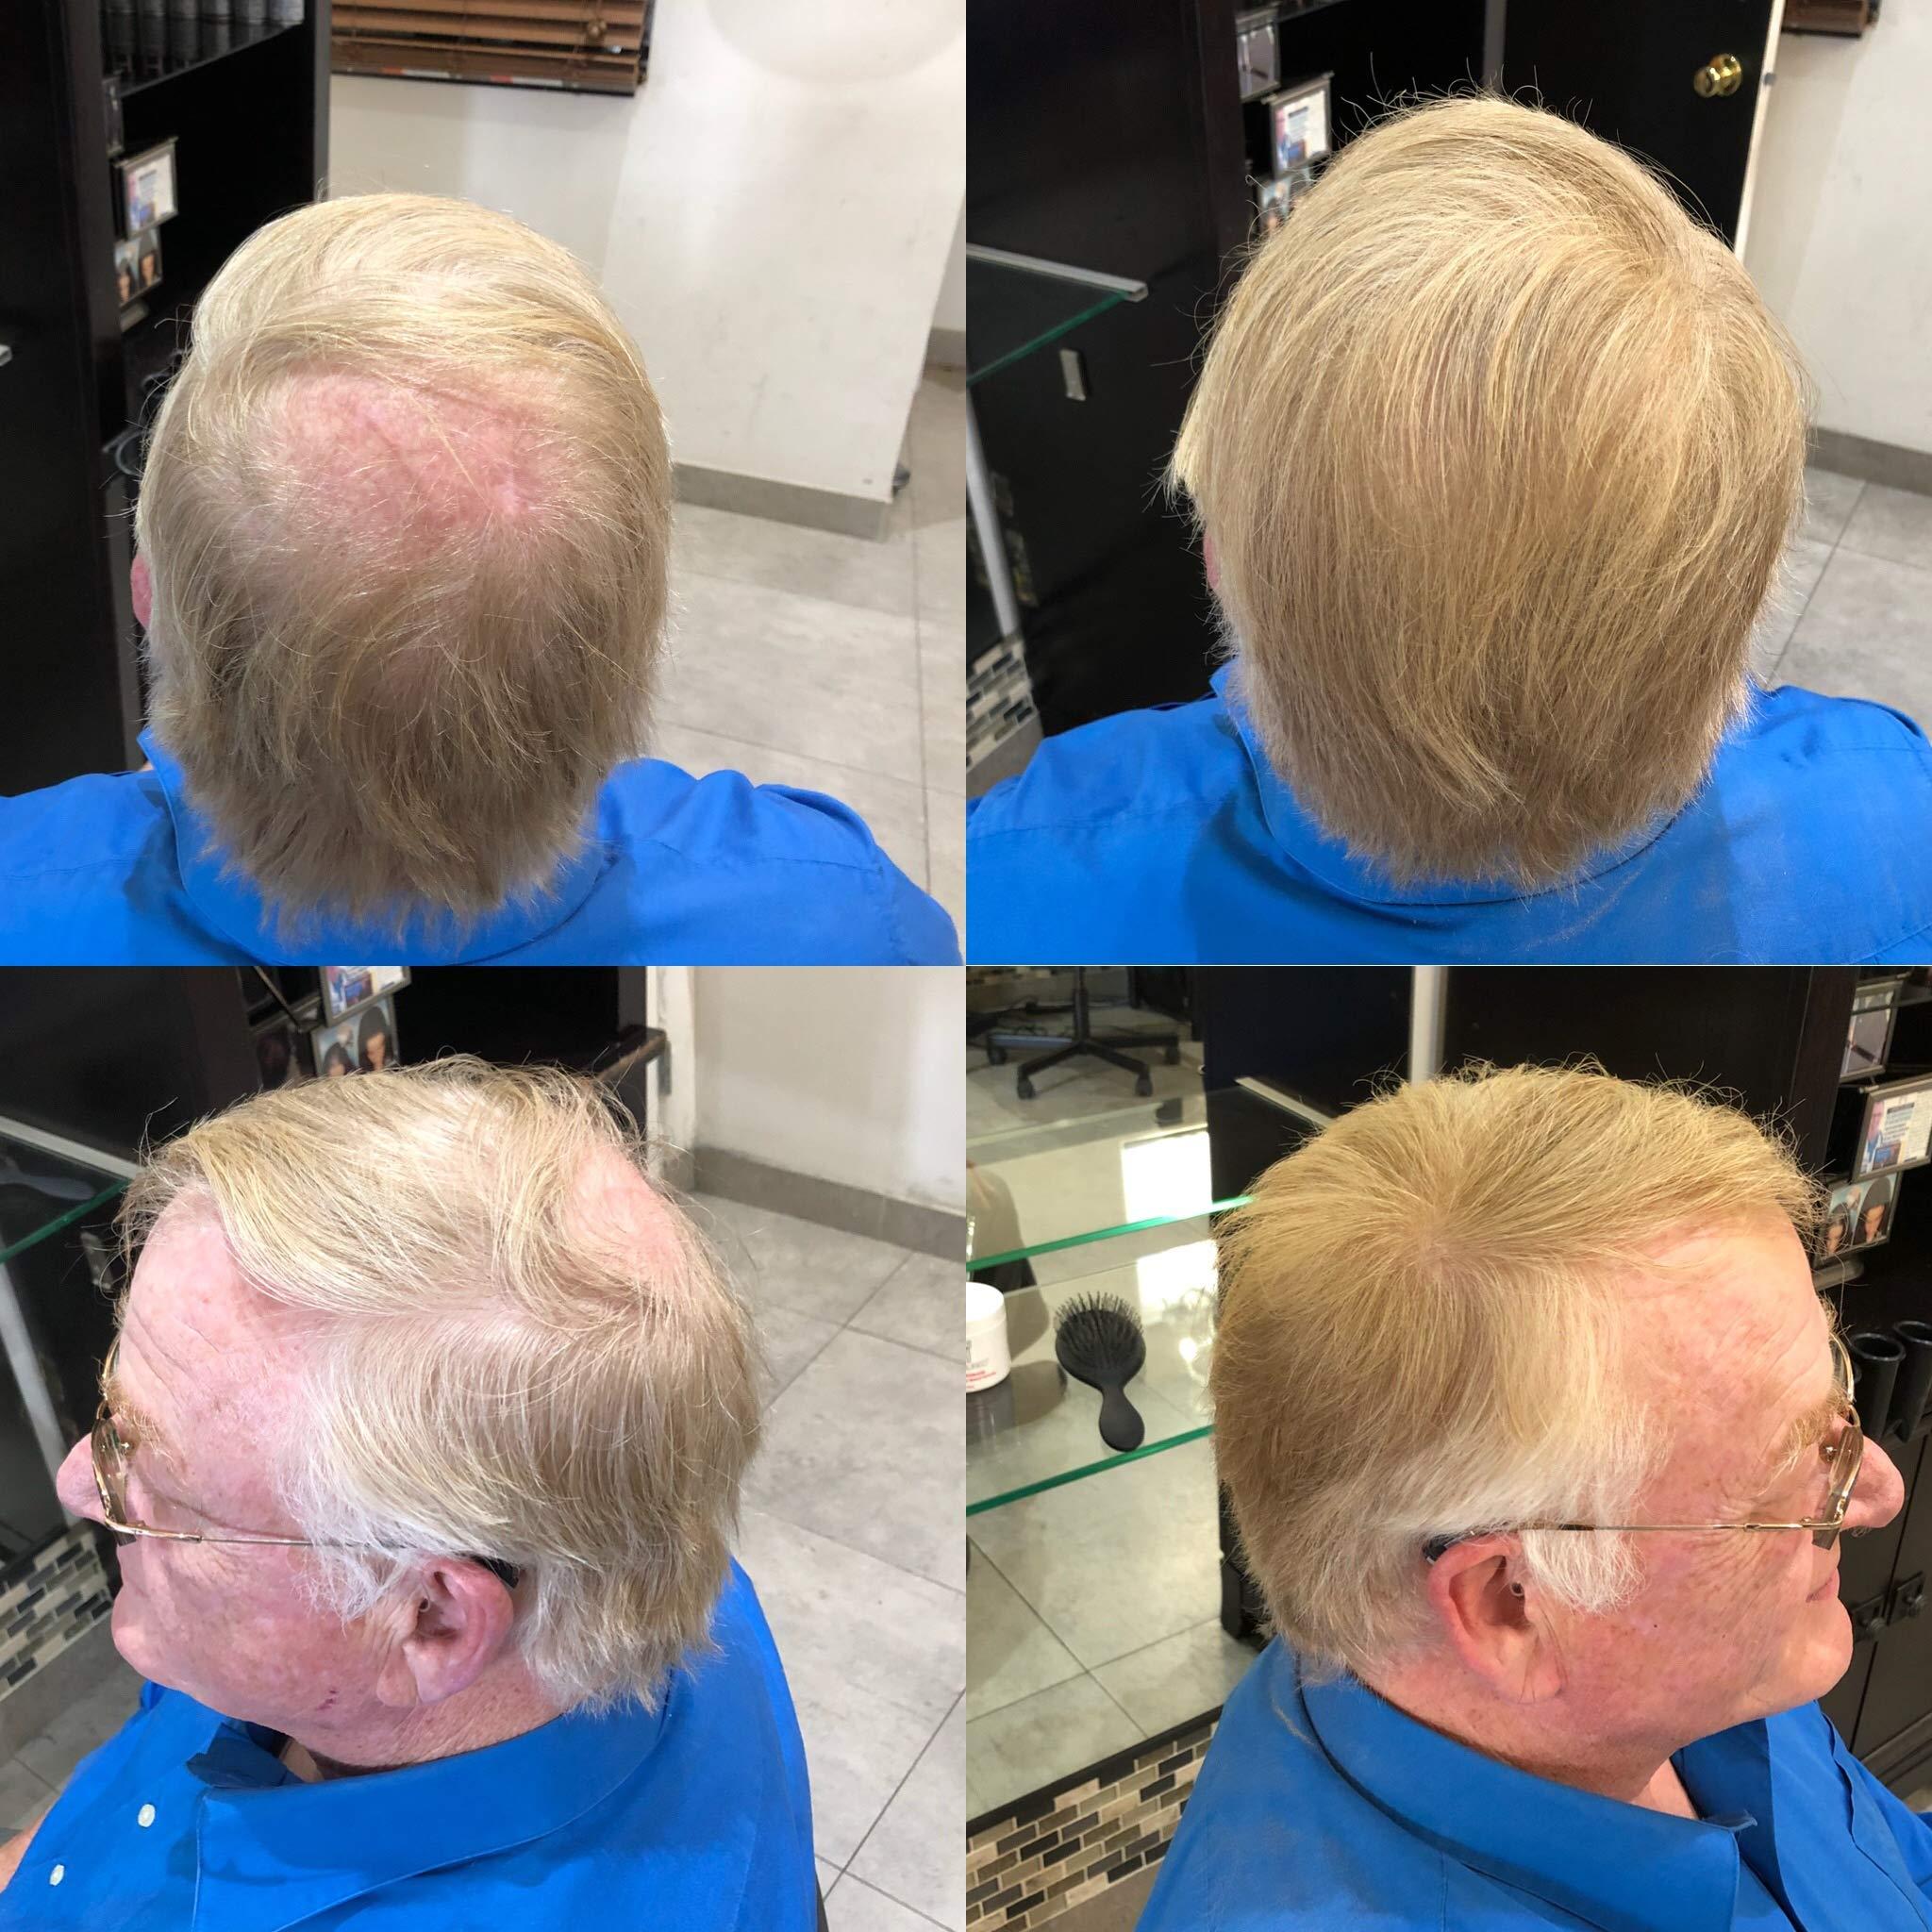 Hair Cubed® - Light Blond, Hair Building Fiber Spray -(Water Proof) Lasts 2 - 5 Months by Hair Cubed  Light Blonde Hair Fiber (WaterProof) (Image #2)